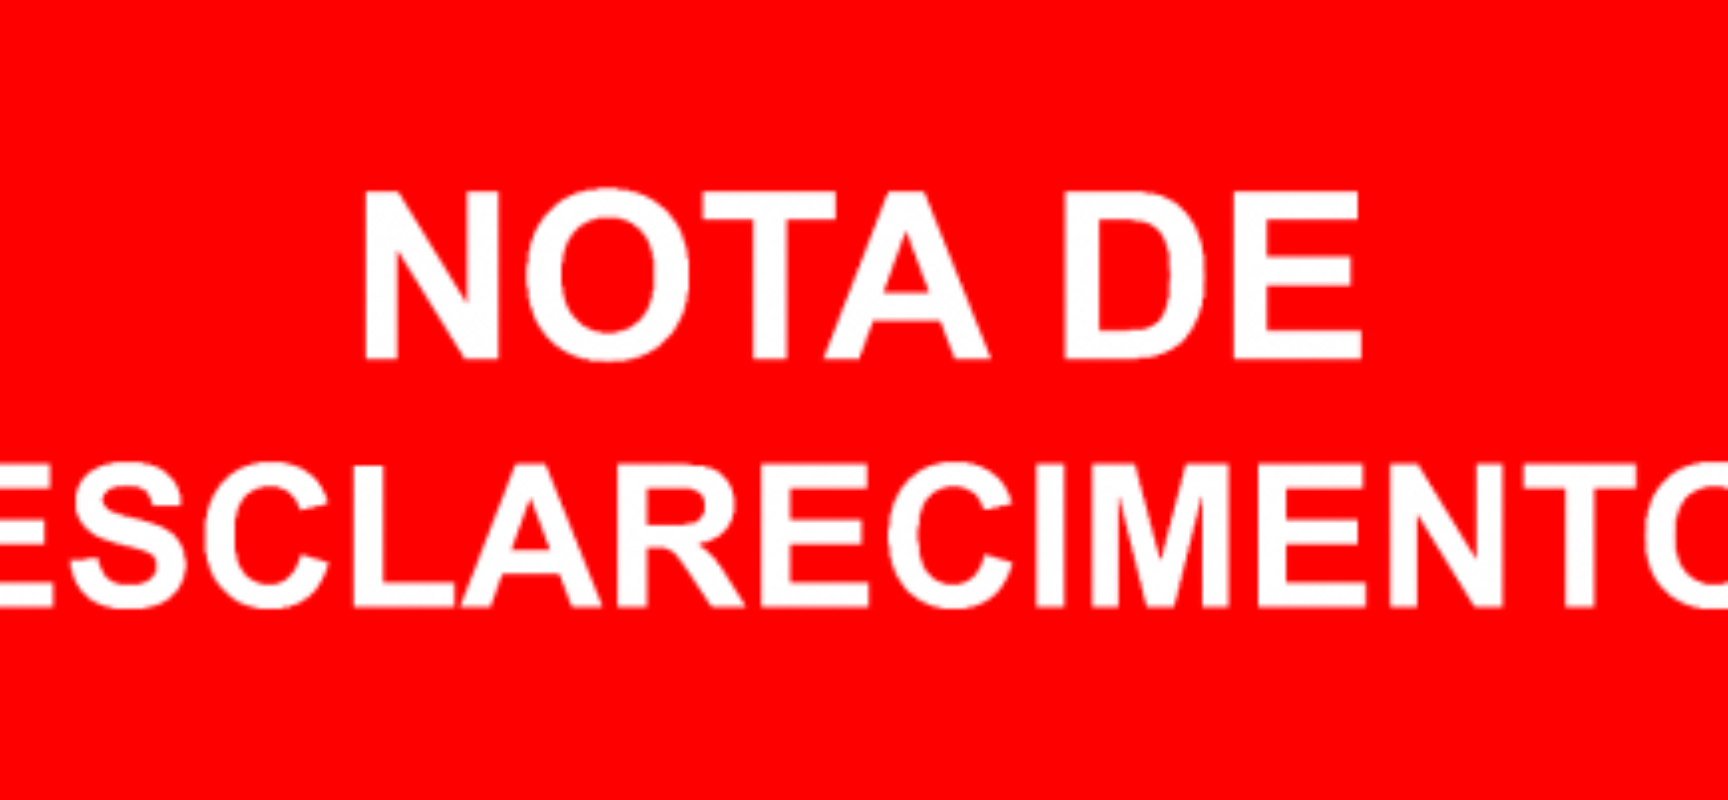 Nota de Esclarecimento sobre o estado de saúde do Vereador Luca Lima